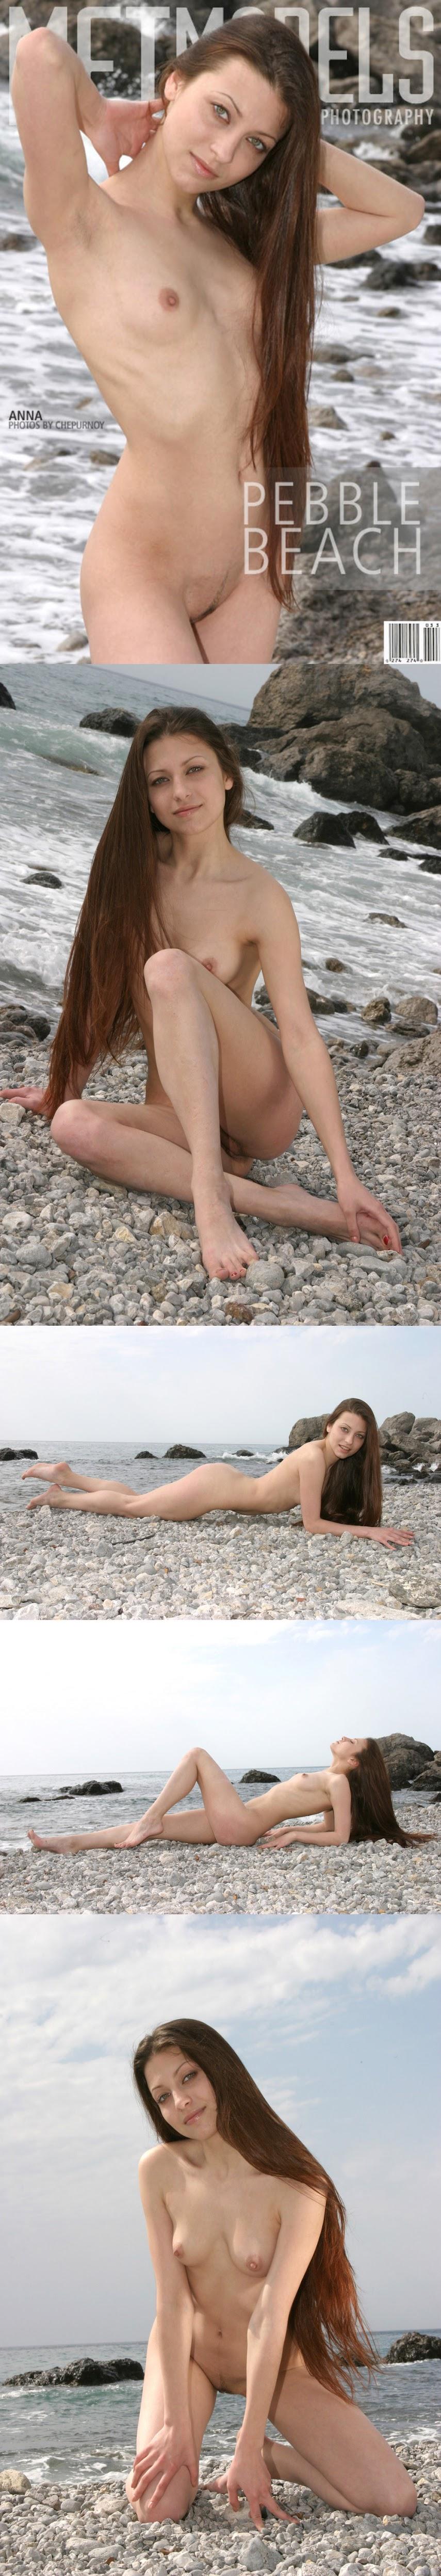 04_ANNA_PEBBLE_BEACH_by_Chepurnoy.rar-jk- 04 ANNA PEBBLE BEACH by Chepurnoy 09300 04